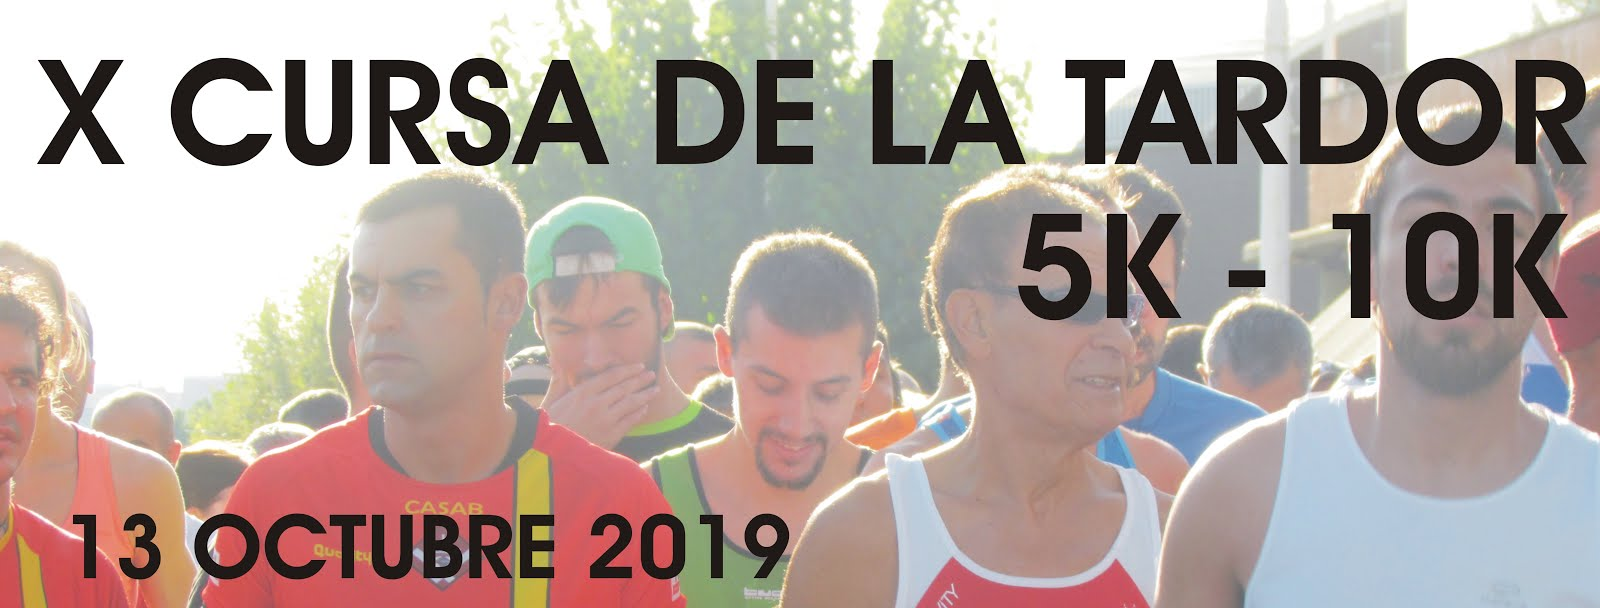 10ª CURSA DE LA TARDOR - 10K y 5K